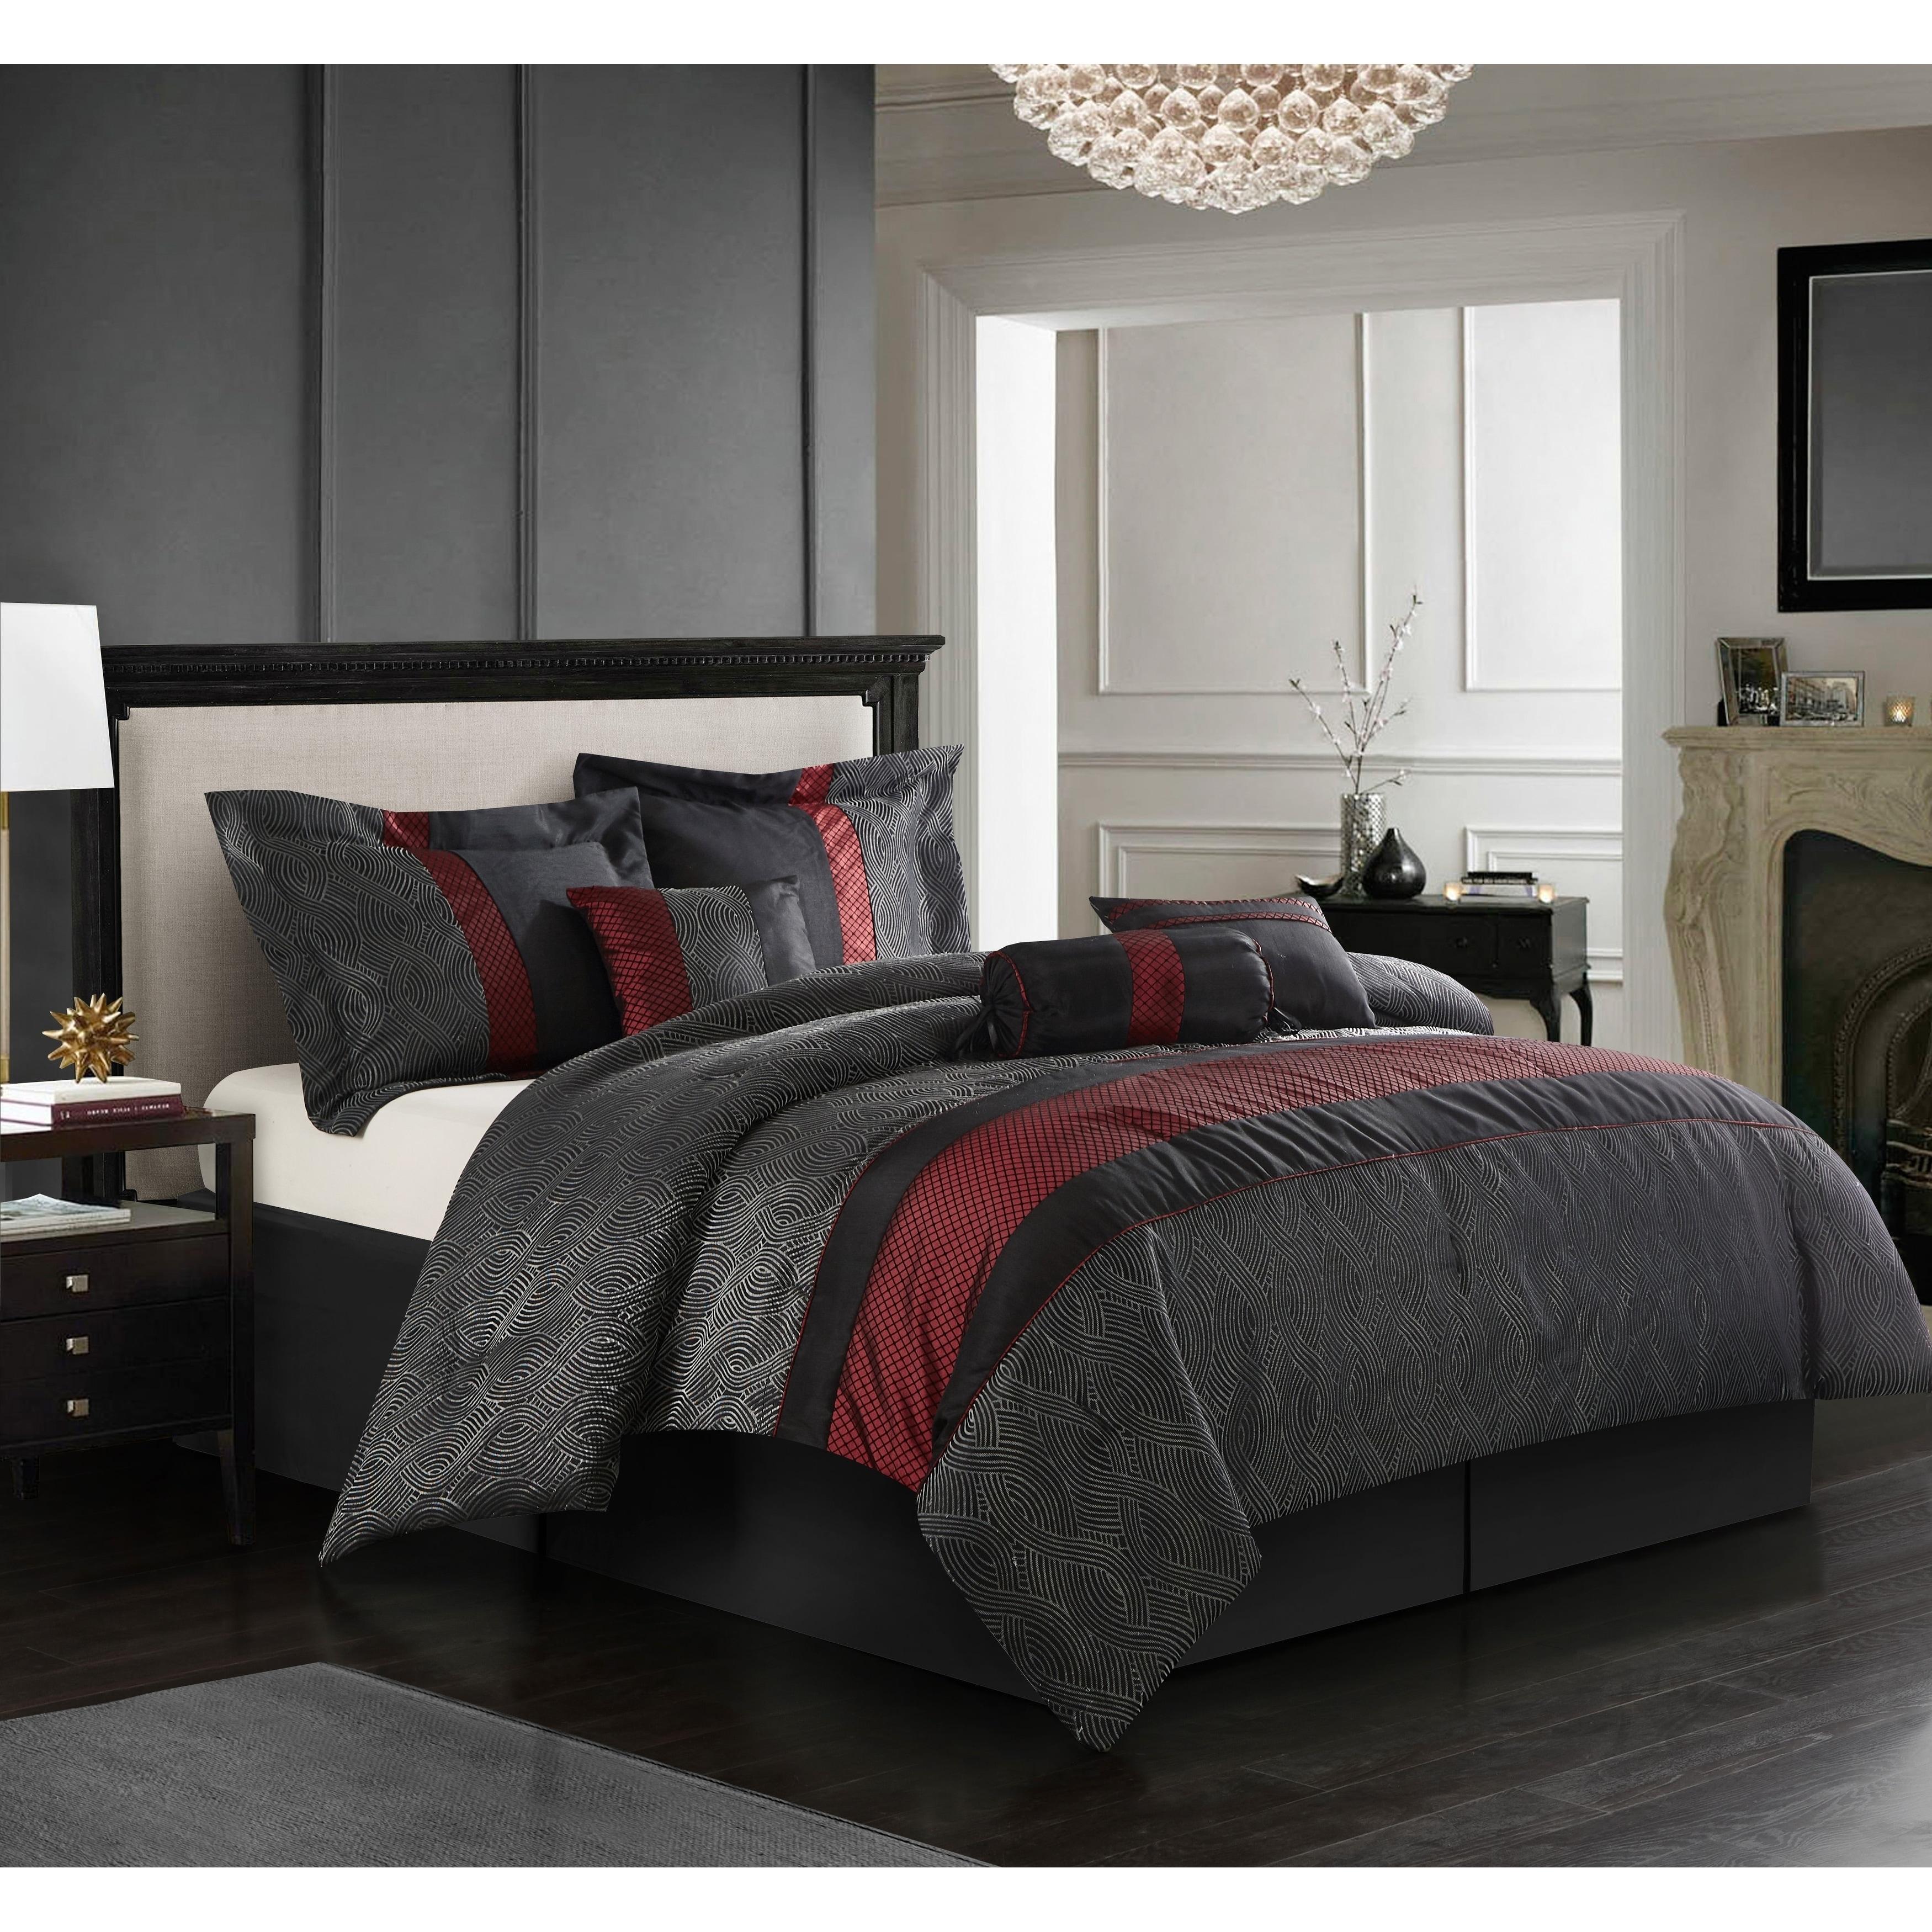 Shop Grand Avenue Ester Red Black 7 Piece Comforter Set On Sale